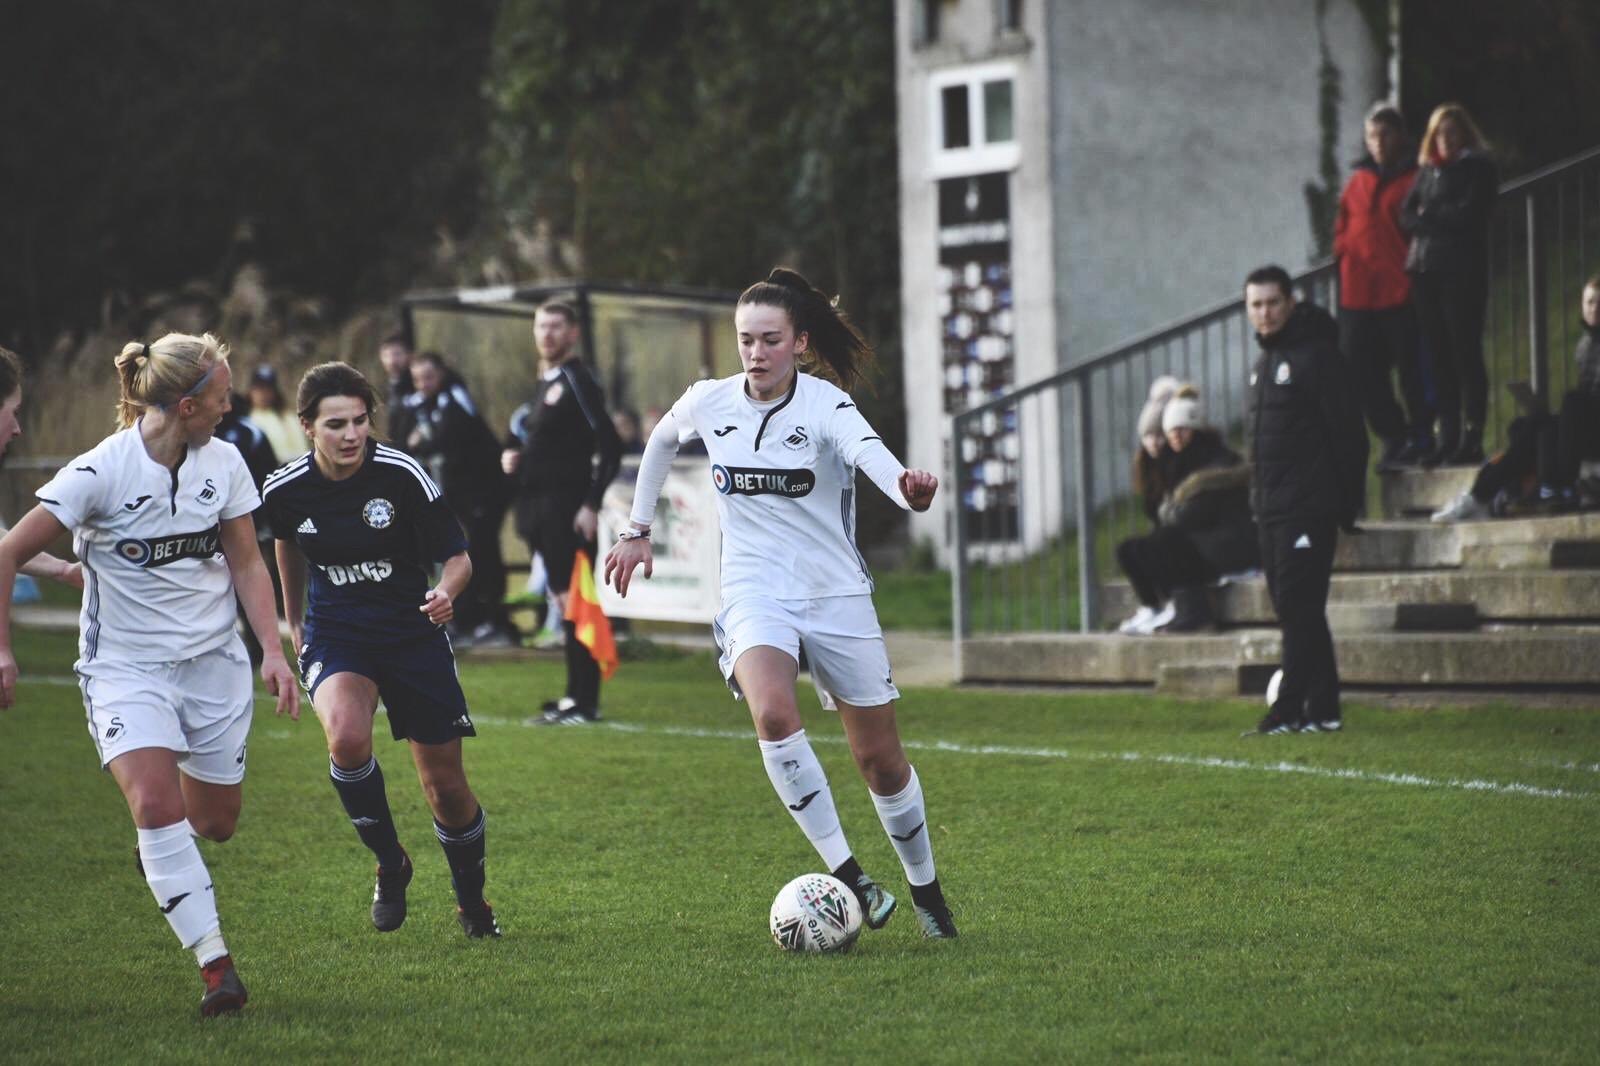 Nieve Jenkins in action for Swansea City Ladies.